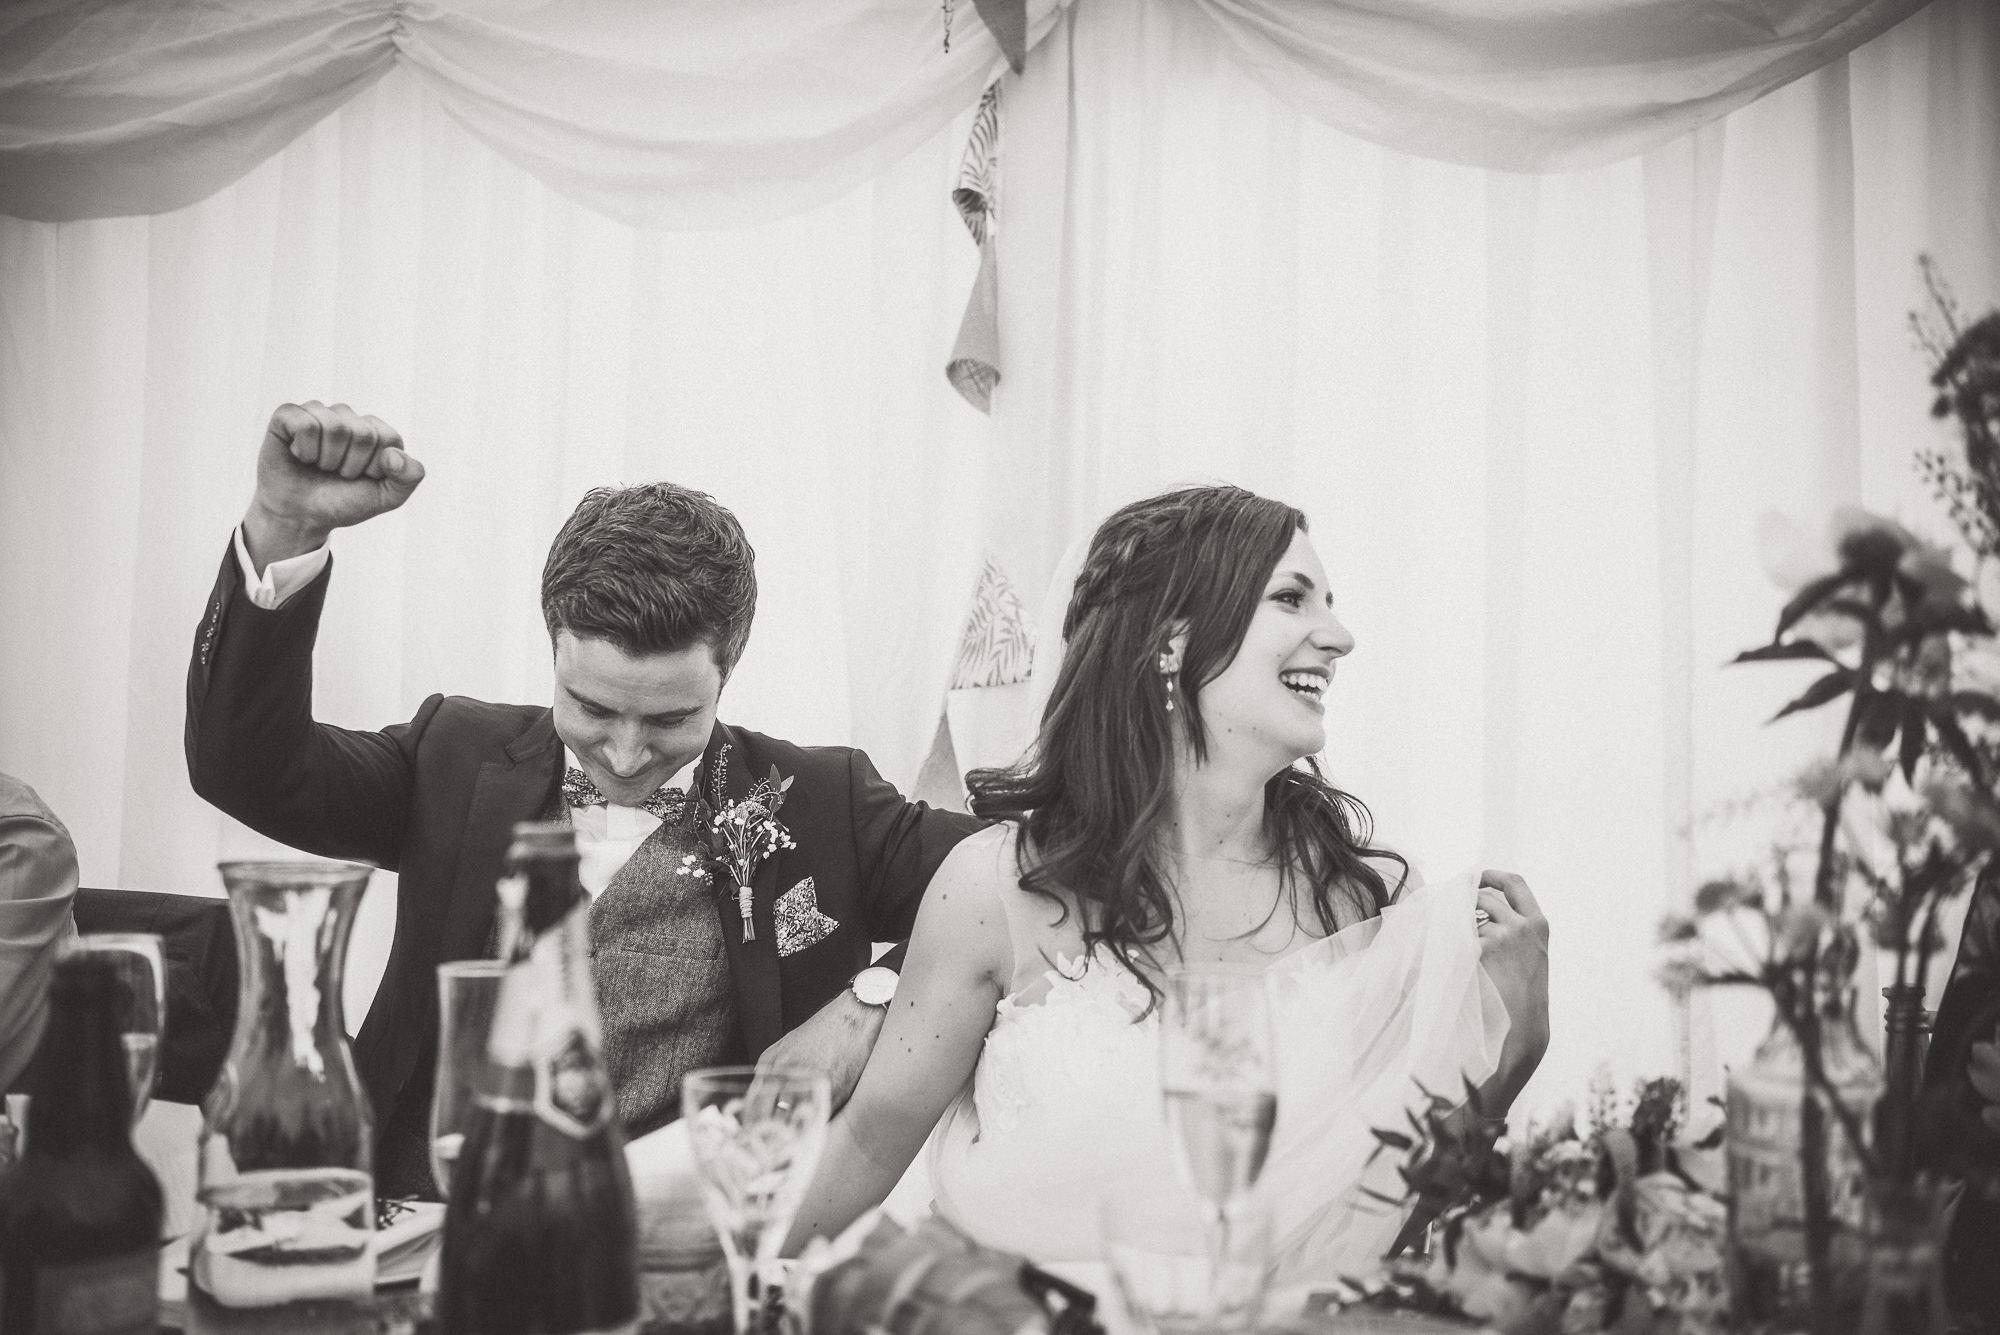 Veils & Bales Wedding Photography | Charlie & Steve SCSS 196